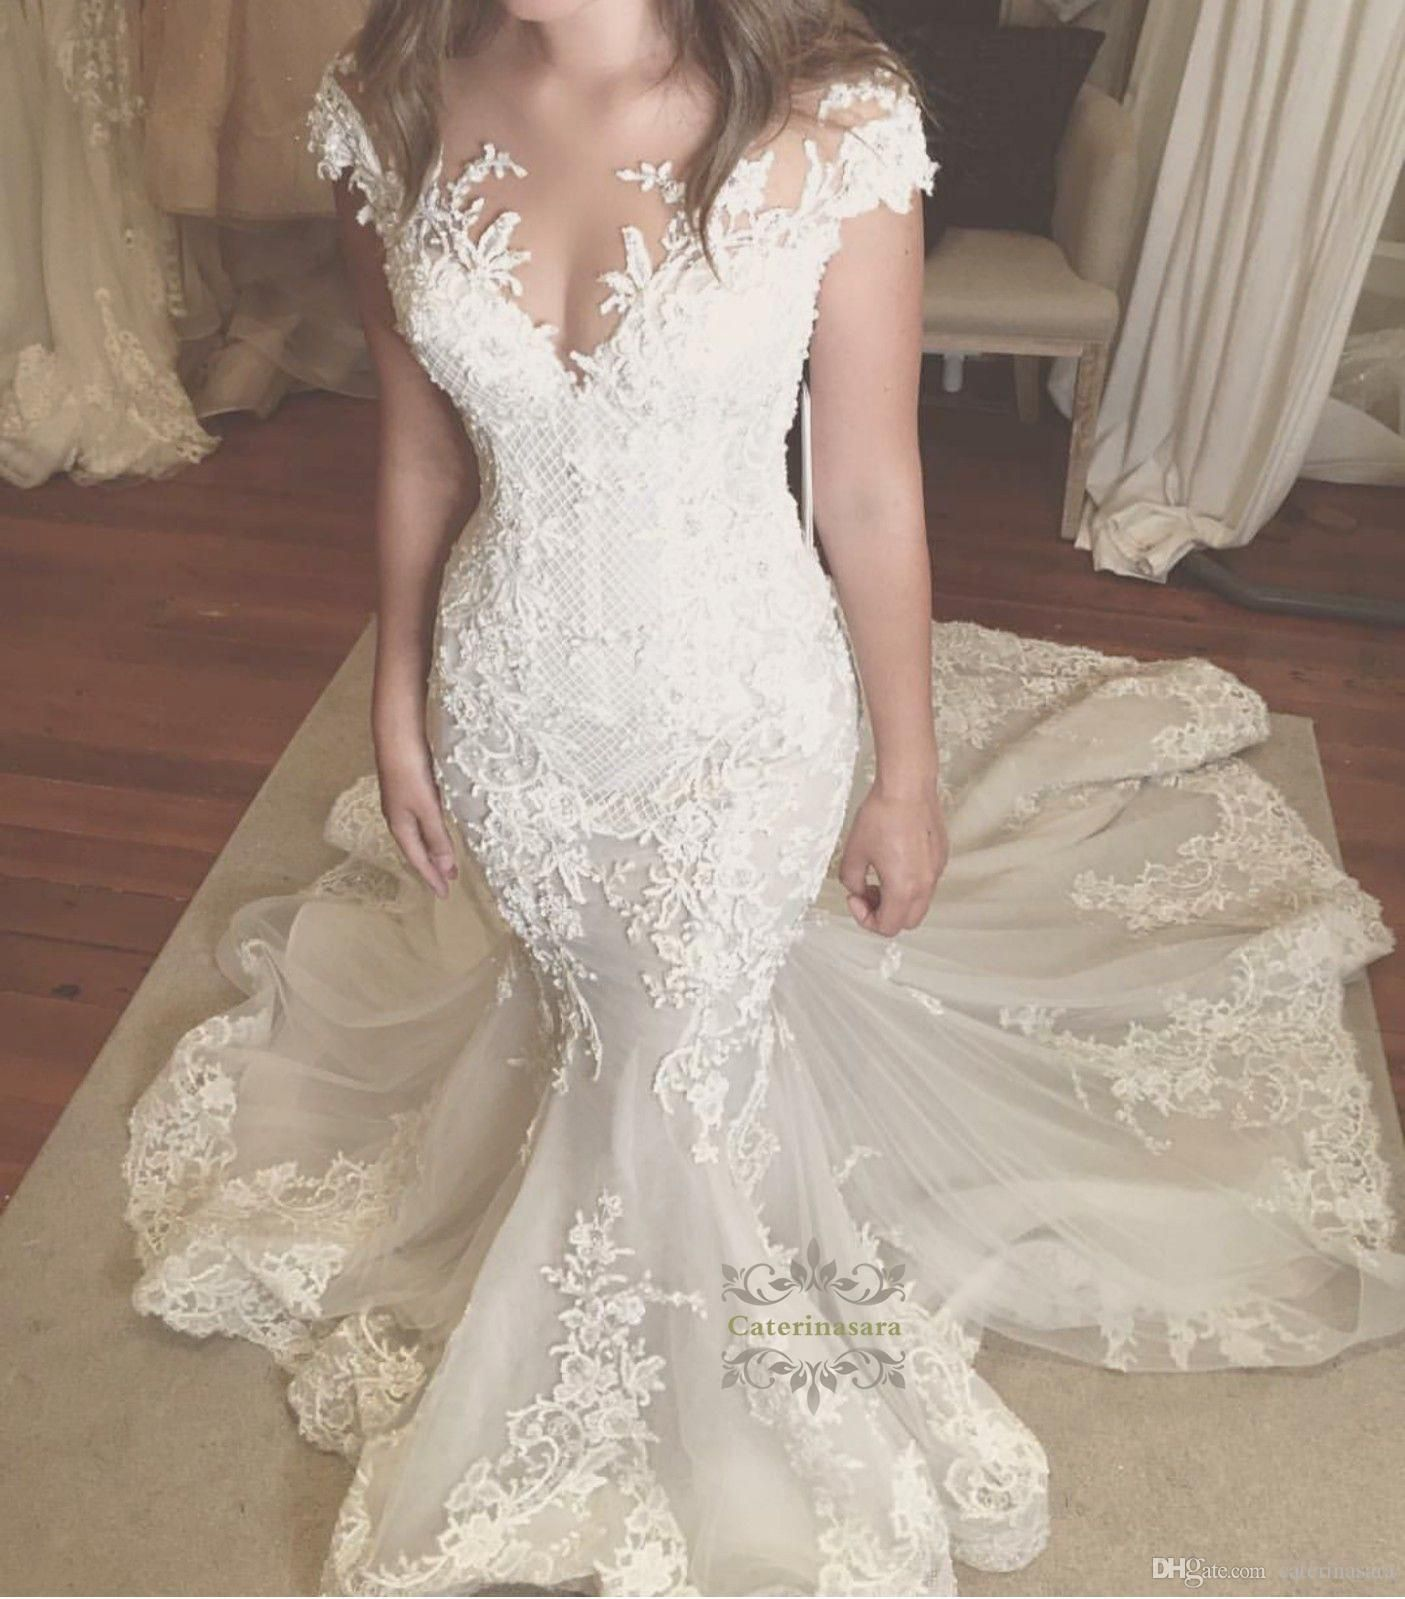 Vintage Lace Cap Sleeves Tulle Princess Wedding Dresses: Vintage Tulle Lace Illusion V Neck Cap Sleeves Mermaid